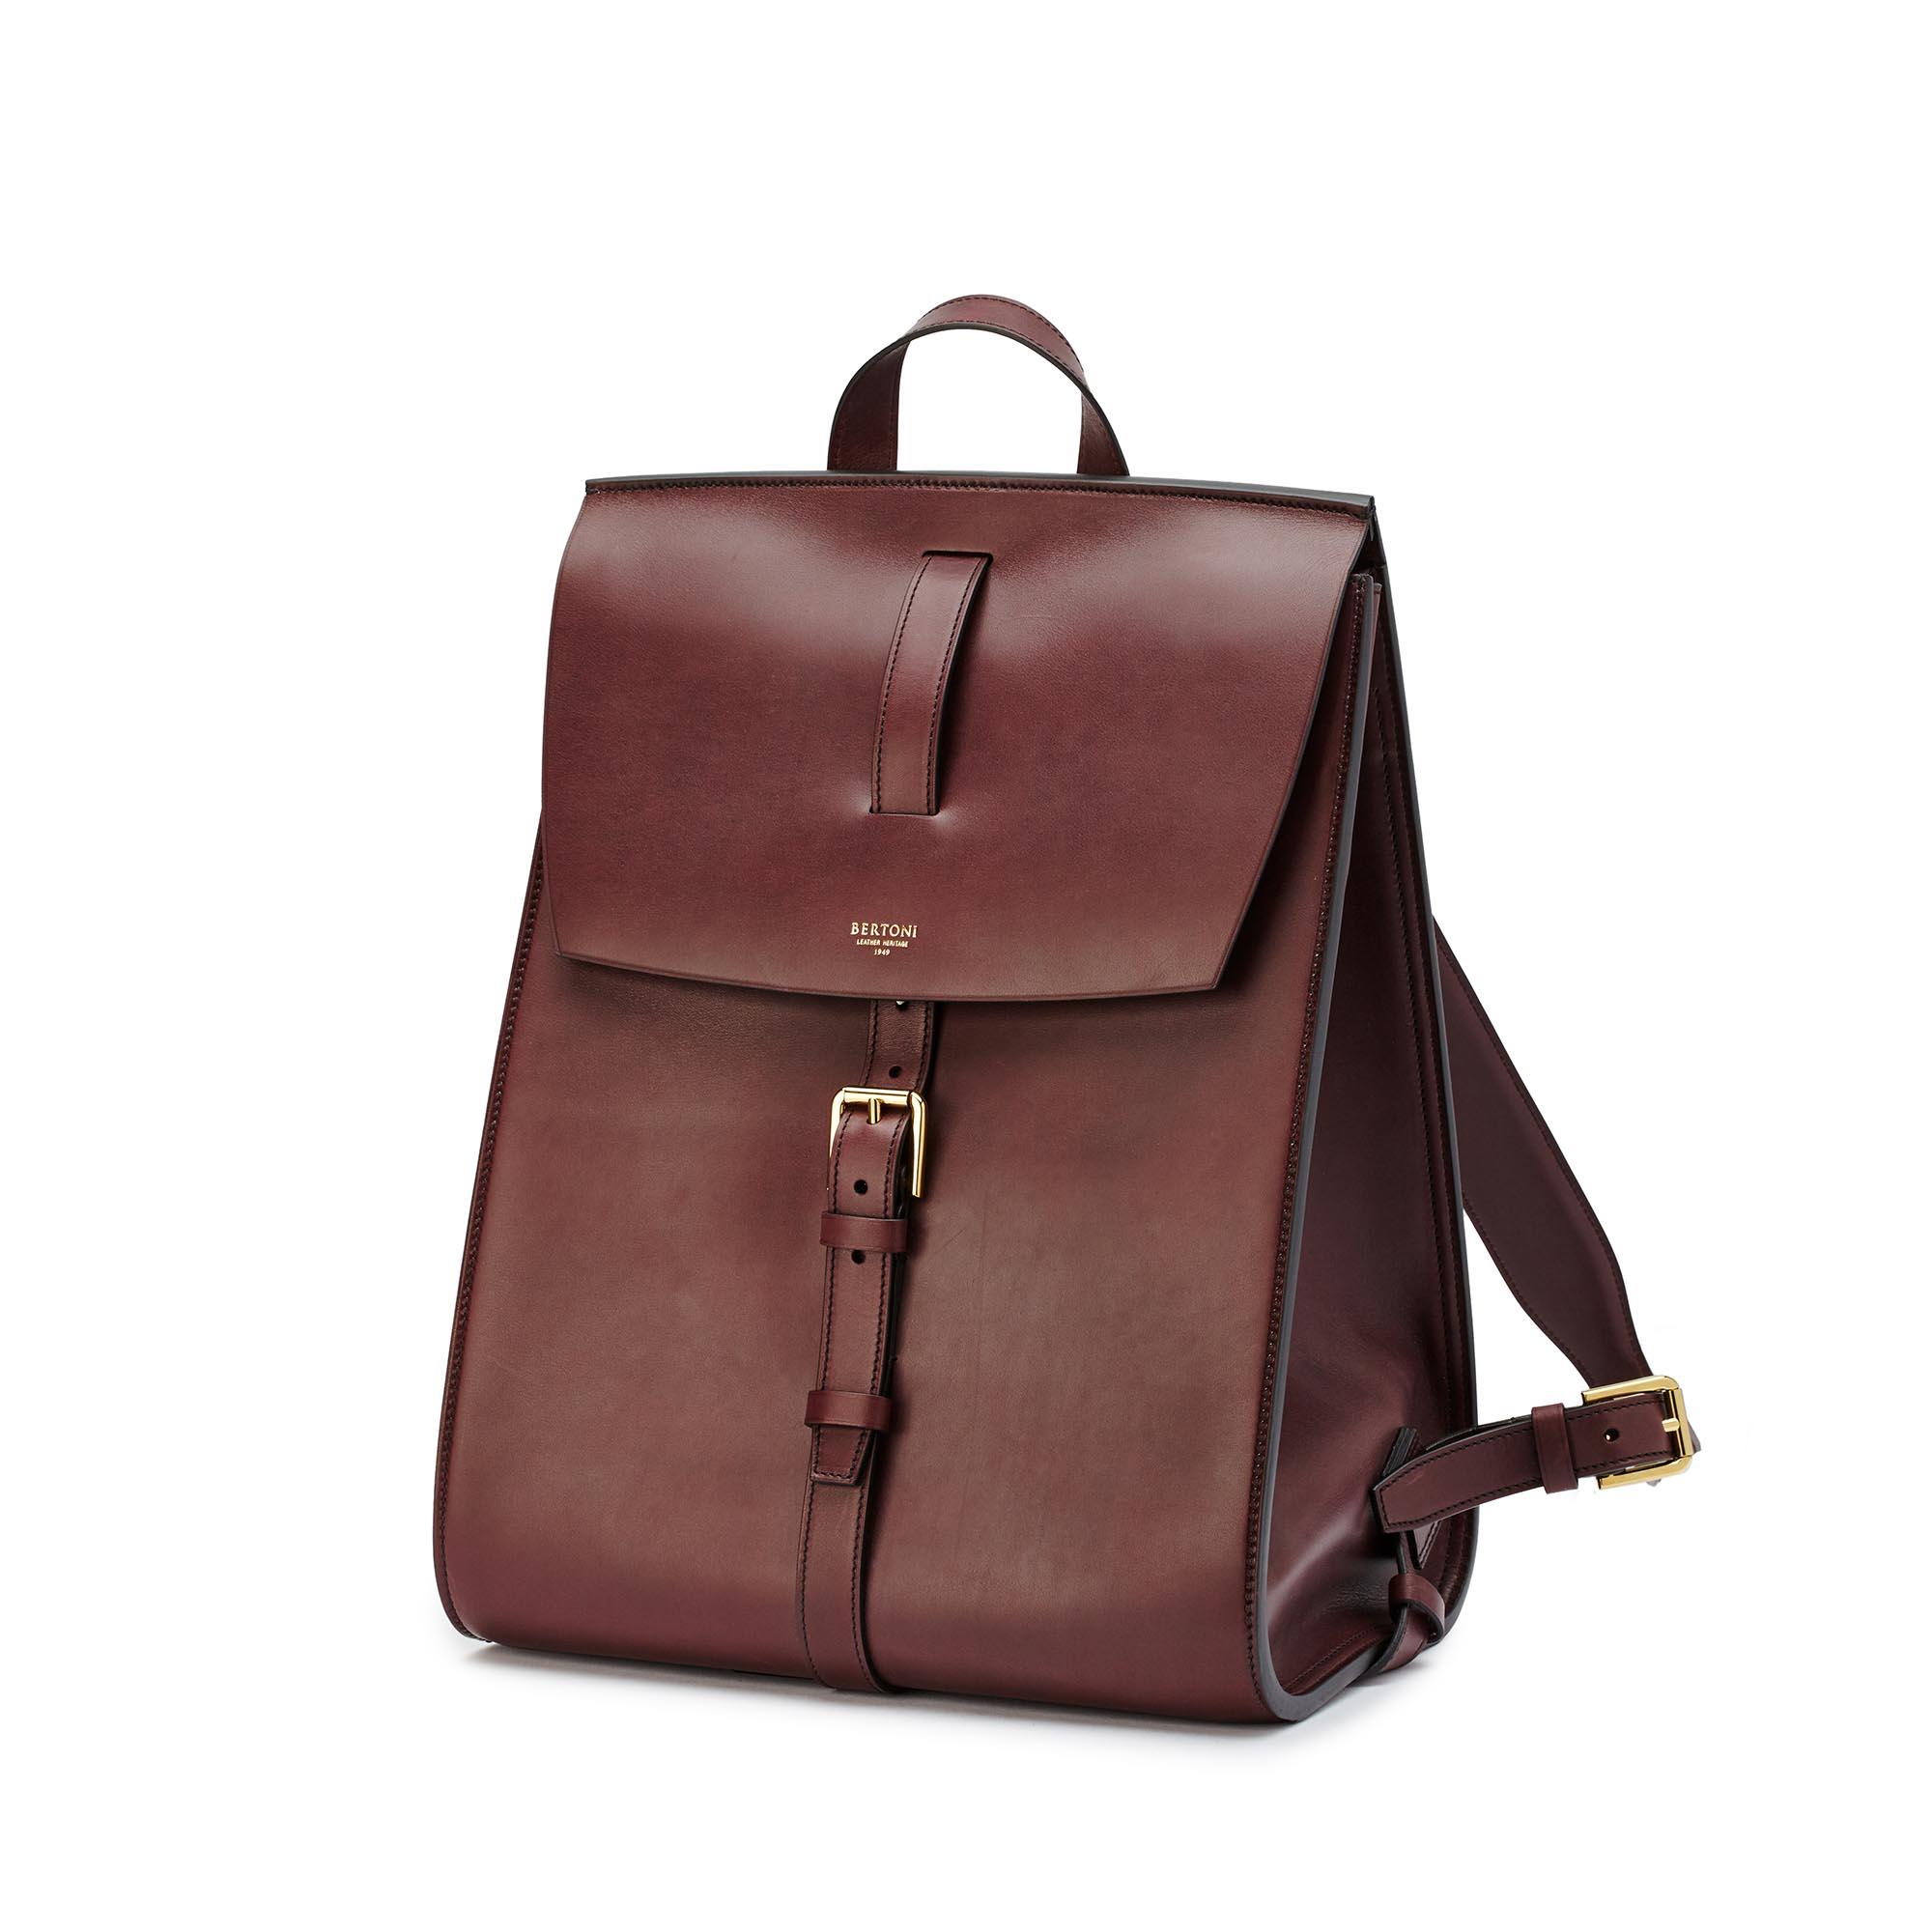 Signature-Backpack-bordeaux-french-calf-bag-Bertoni-1949_01